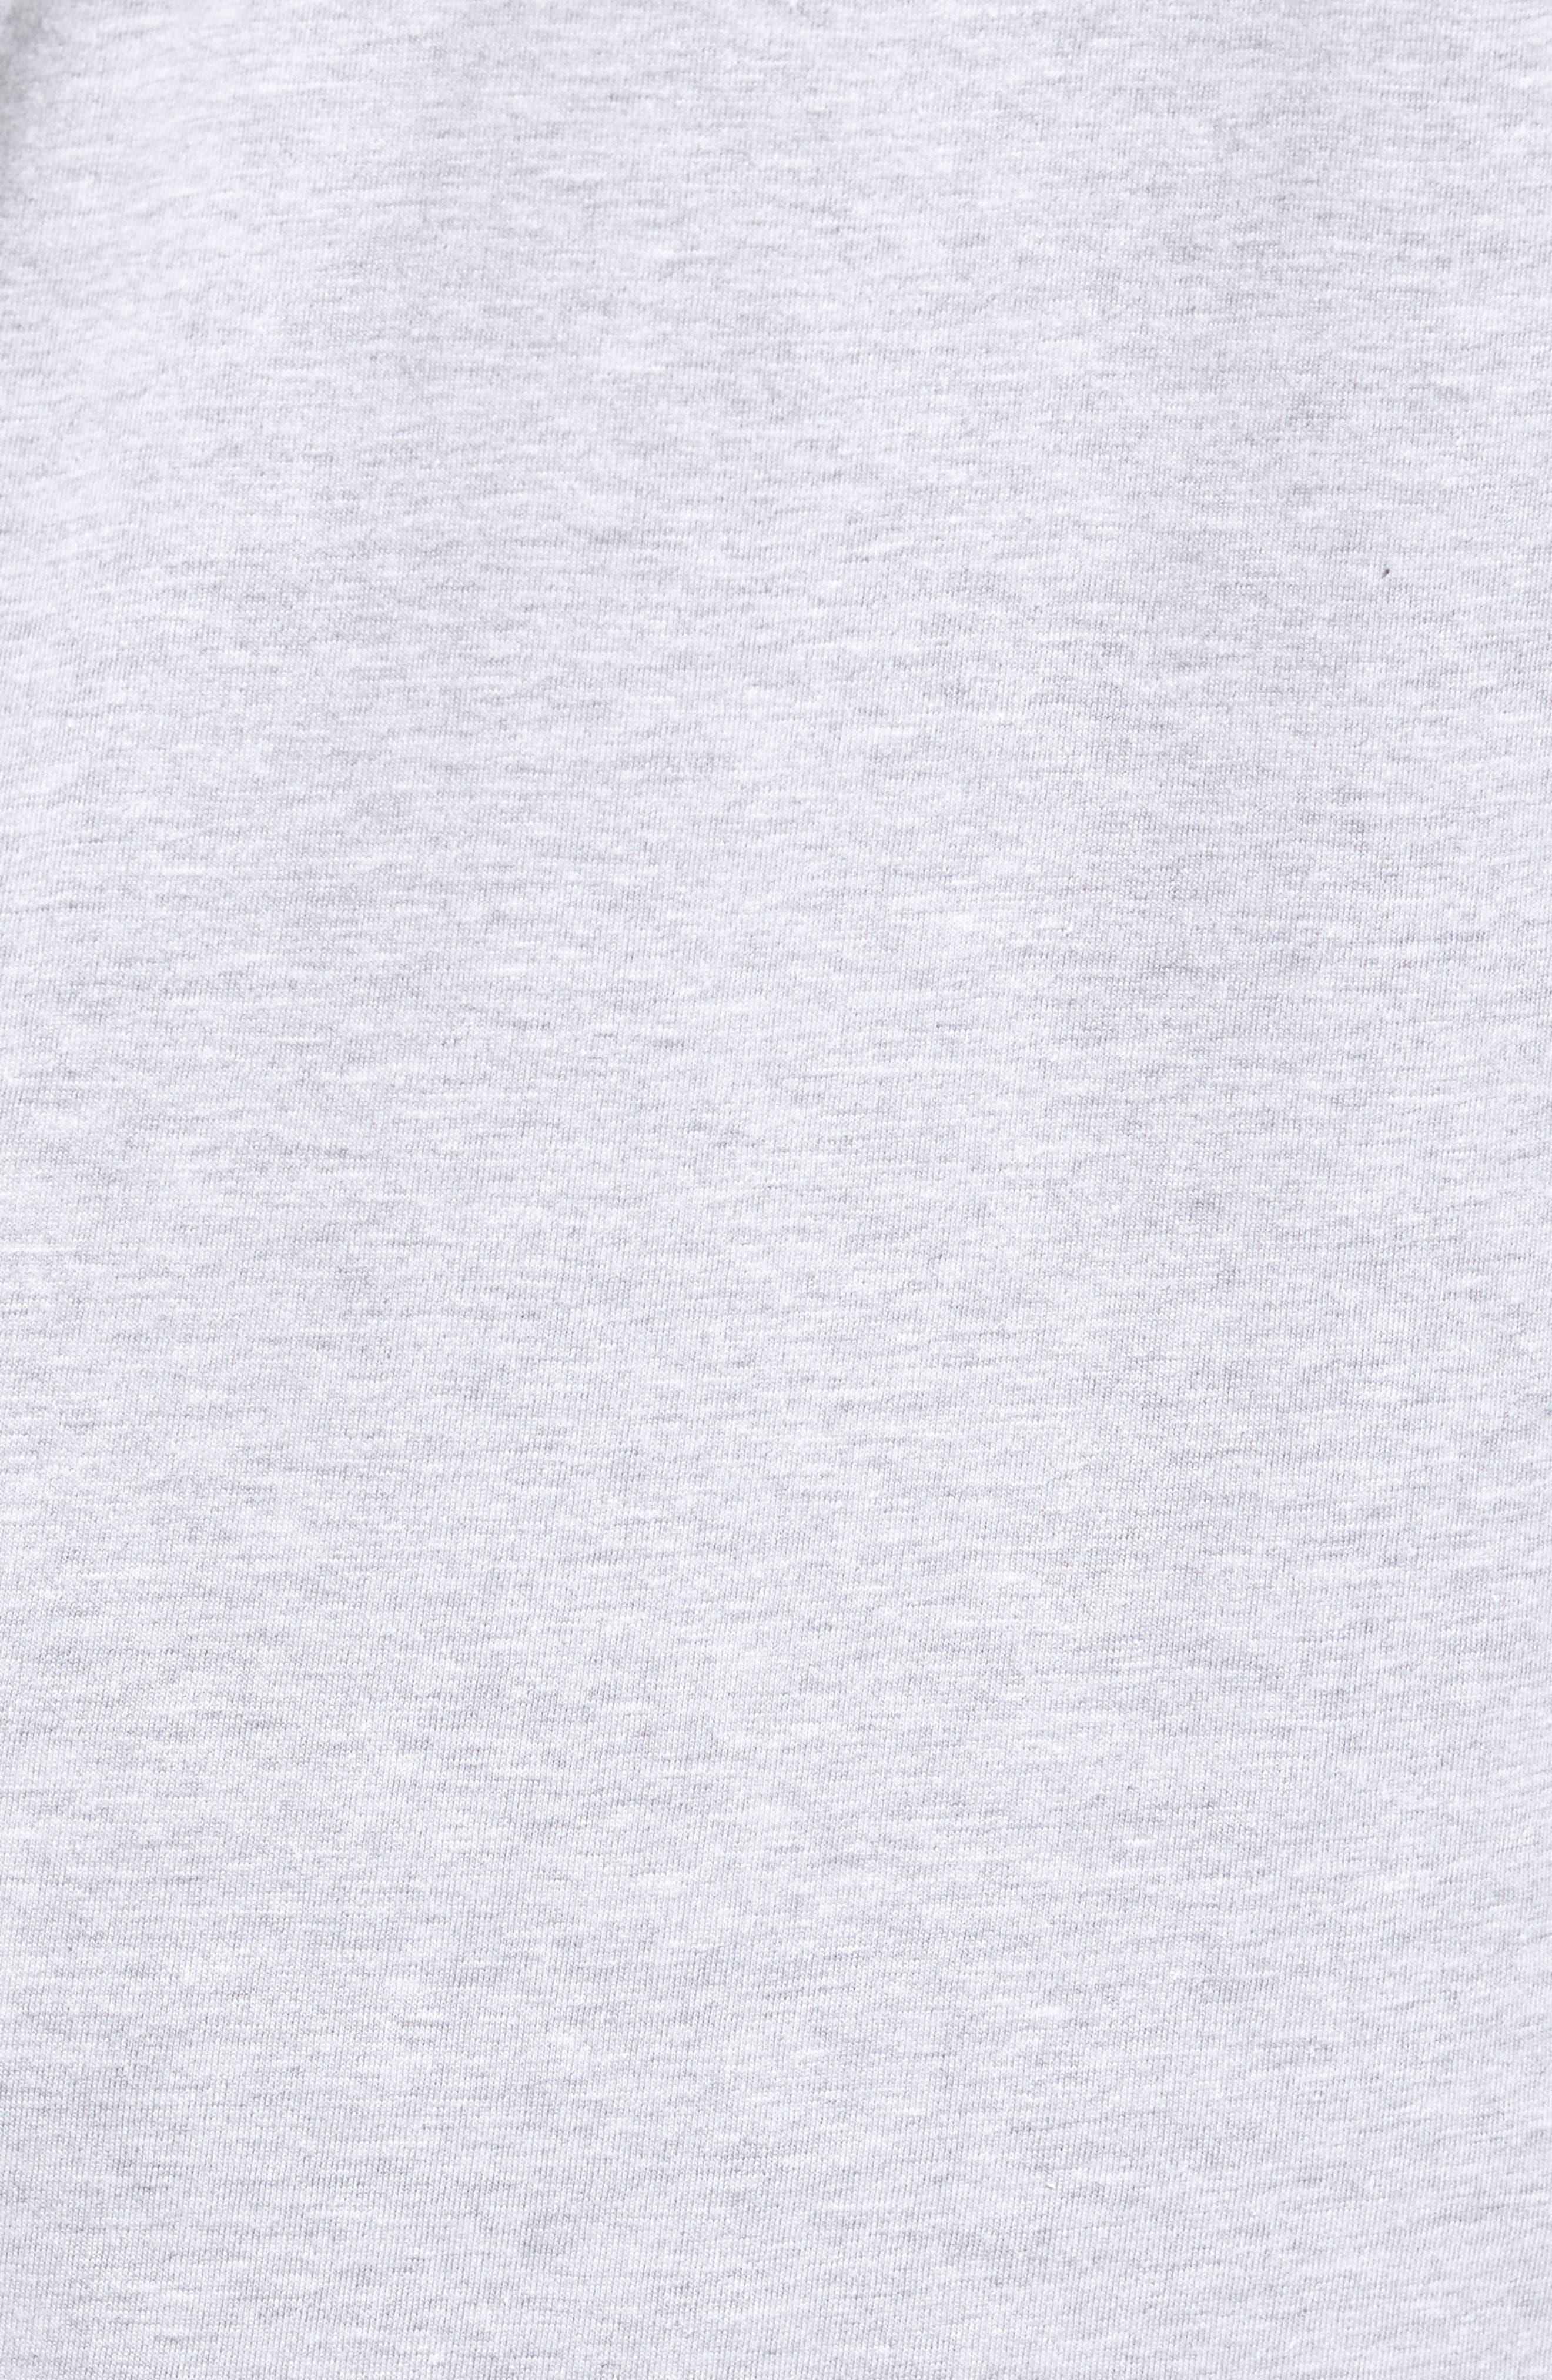 PNW Shield Sweatshirt,                             Alternate thumbnail 5, color,                             020